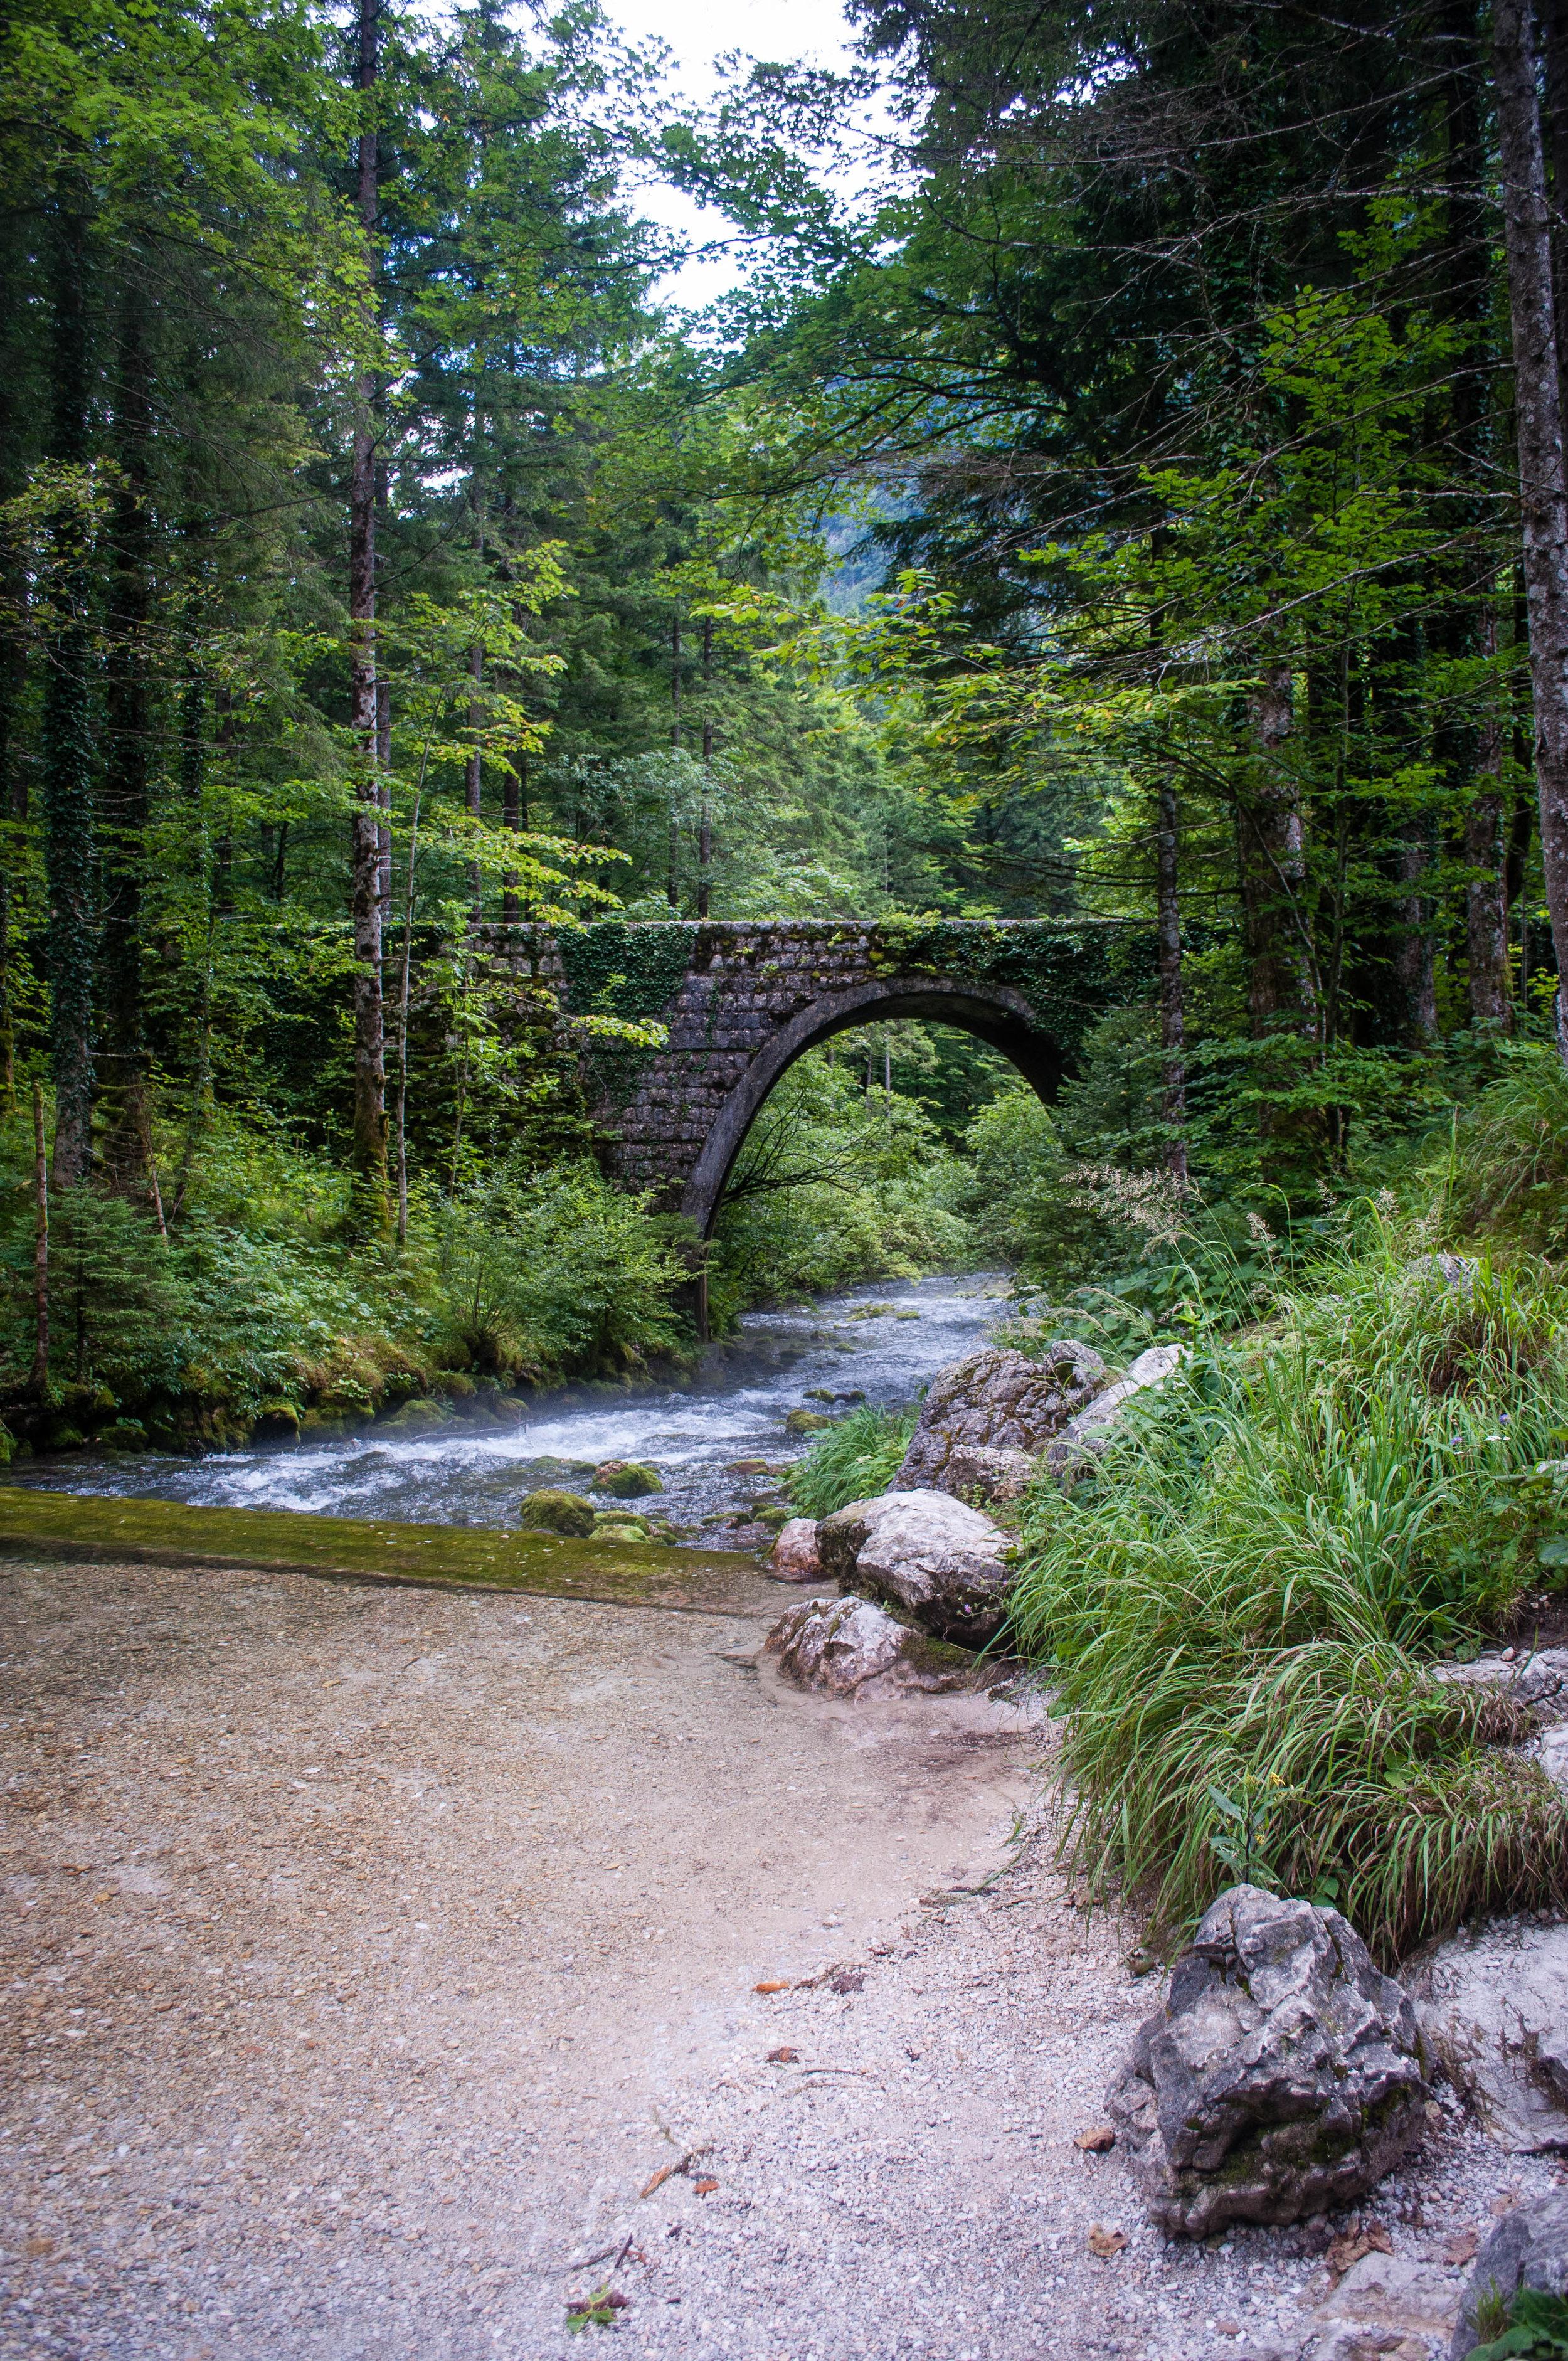 Velika Planina, part of the itinerary Road trip in Slovenia